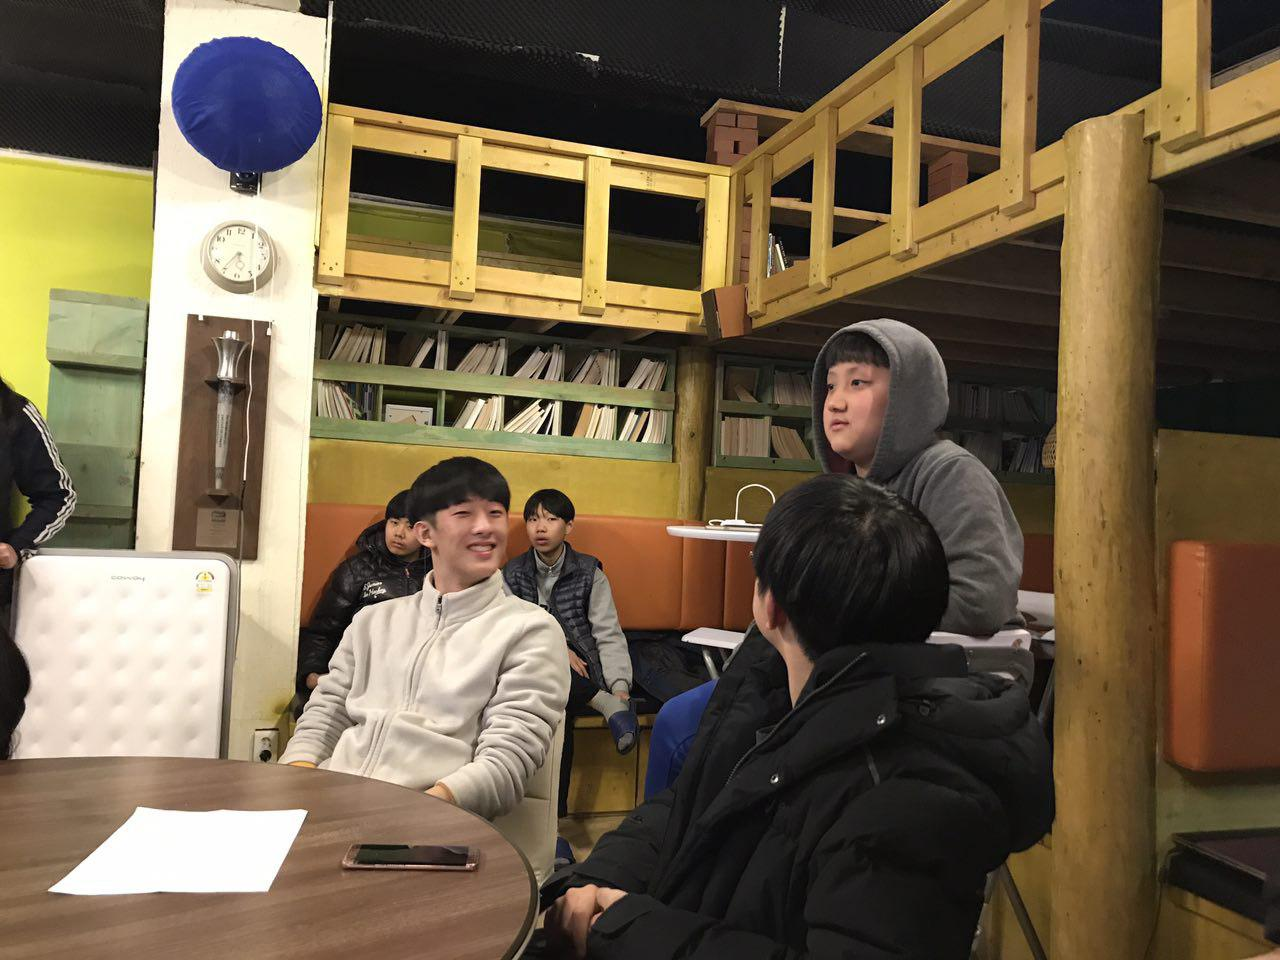 photo_2018-01-12_17-50-13.jpg